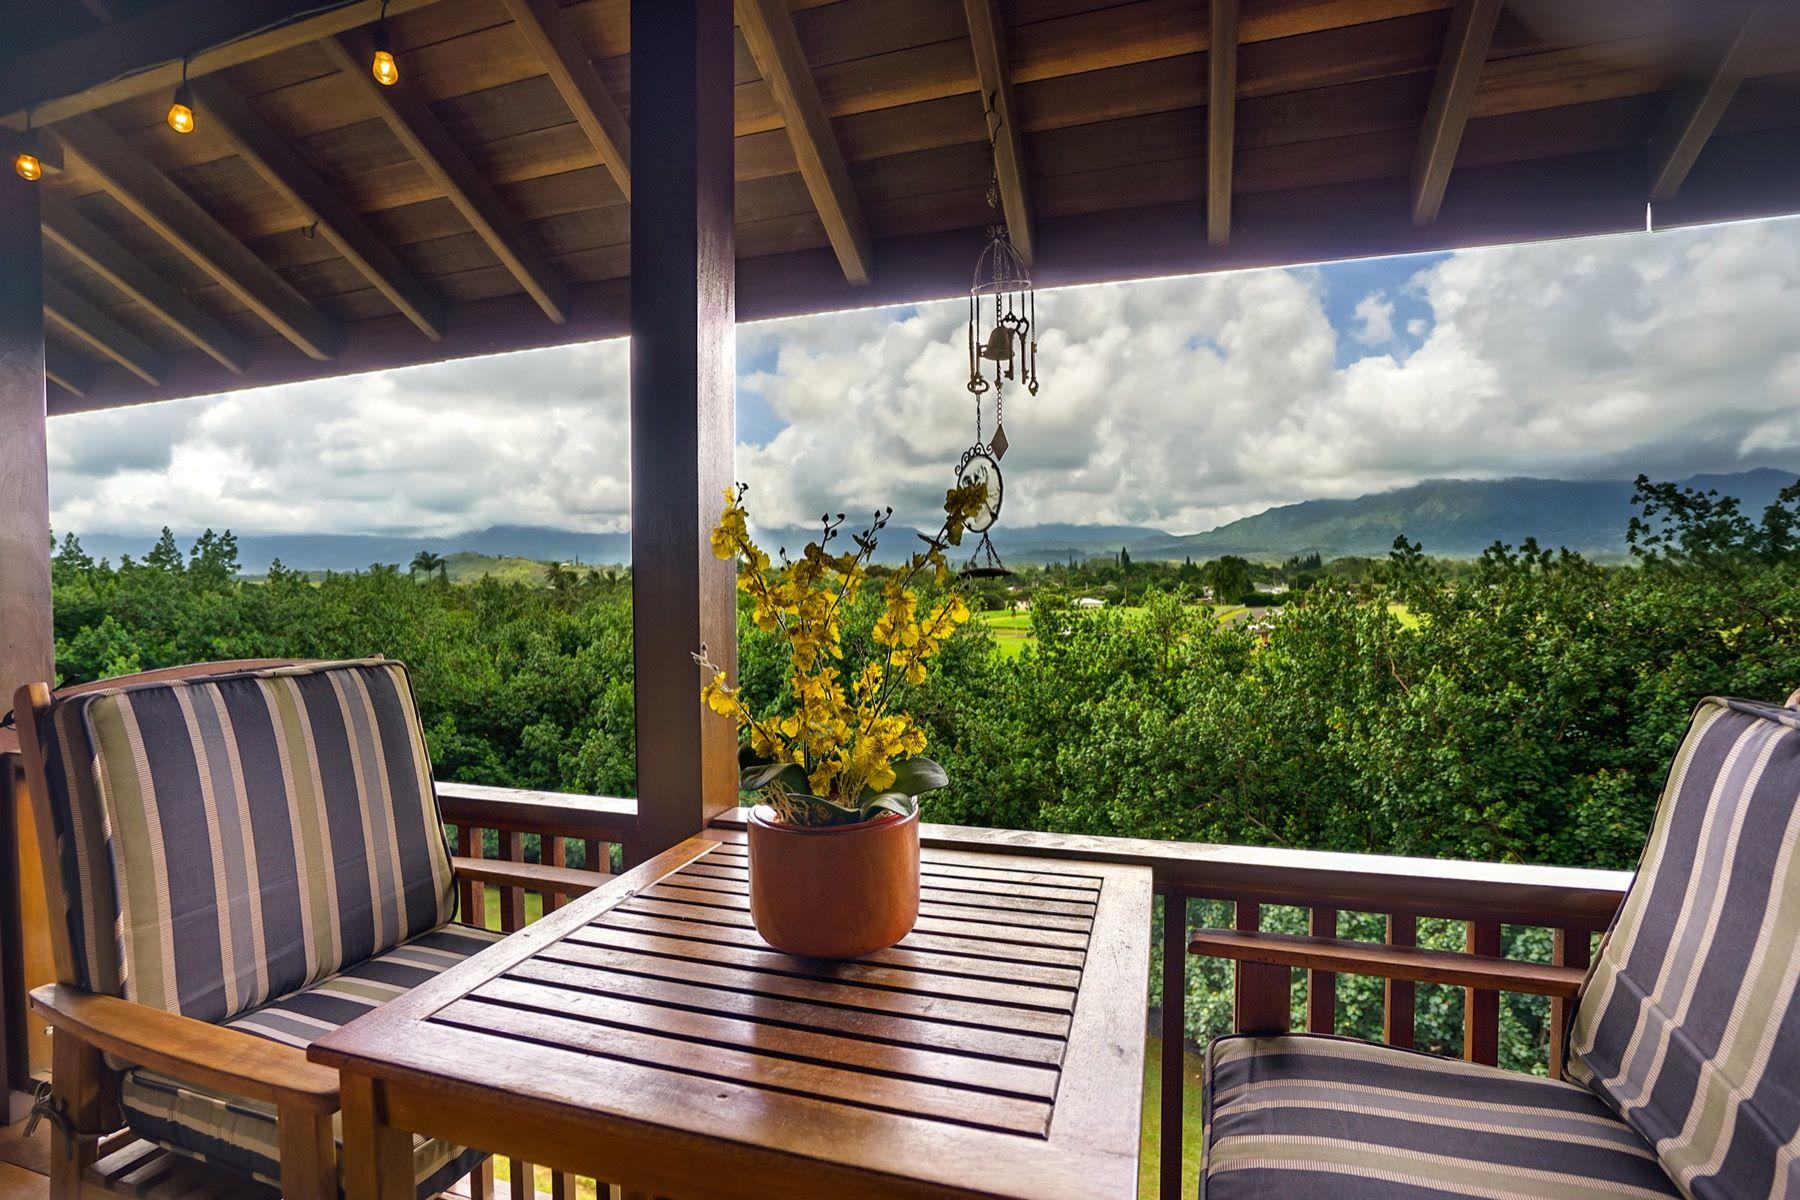 Single Family Home for Sale at Bali inspired living 568-U Kamalu Rd Kapaa, Hawaii 96746 United States